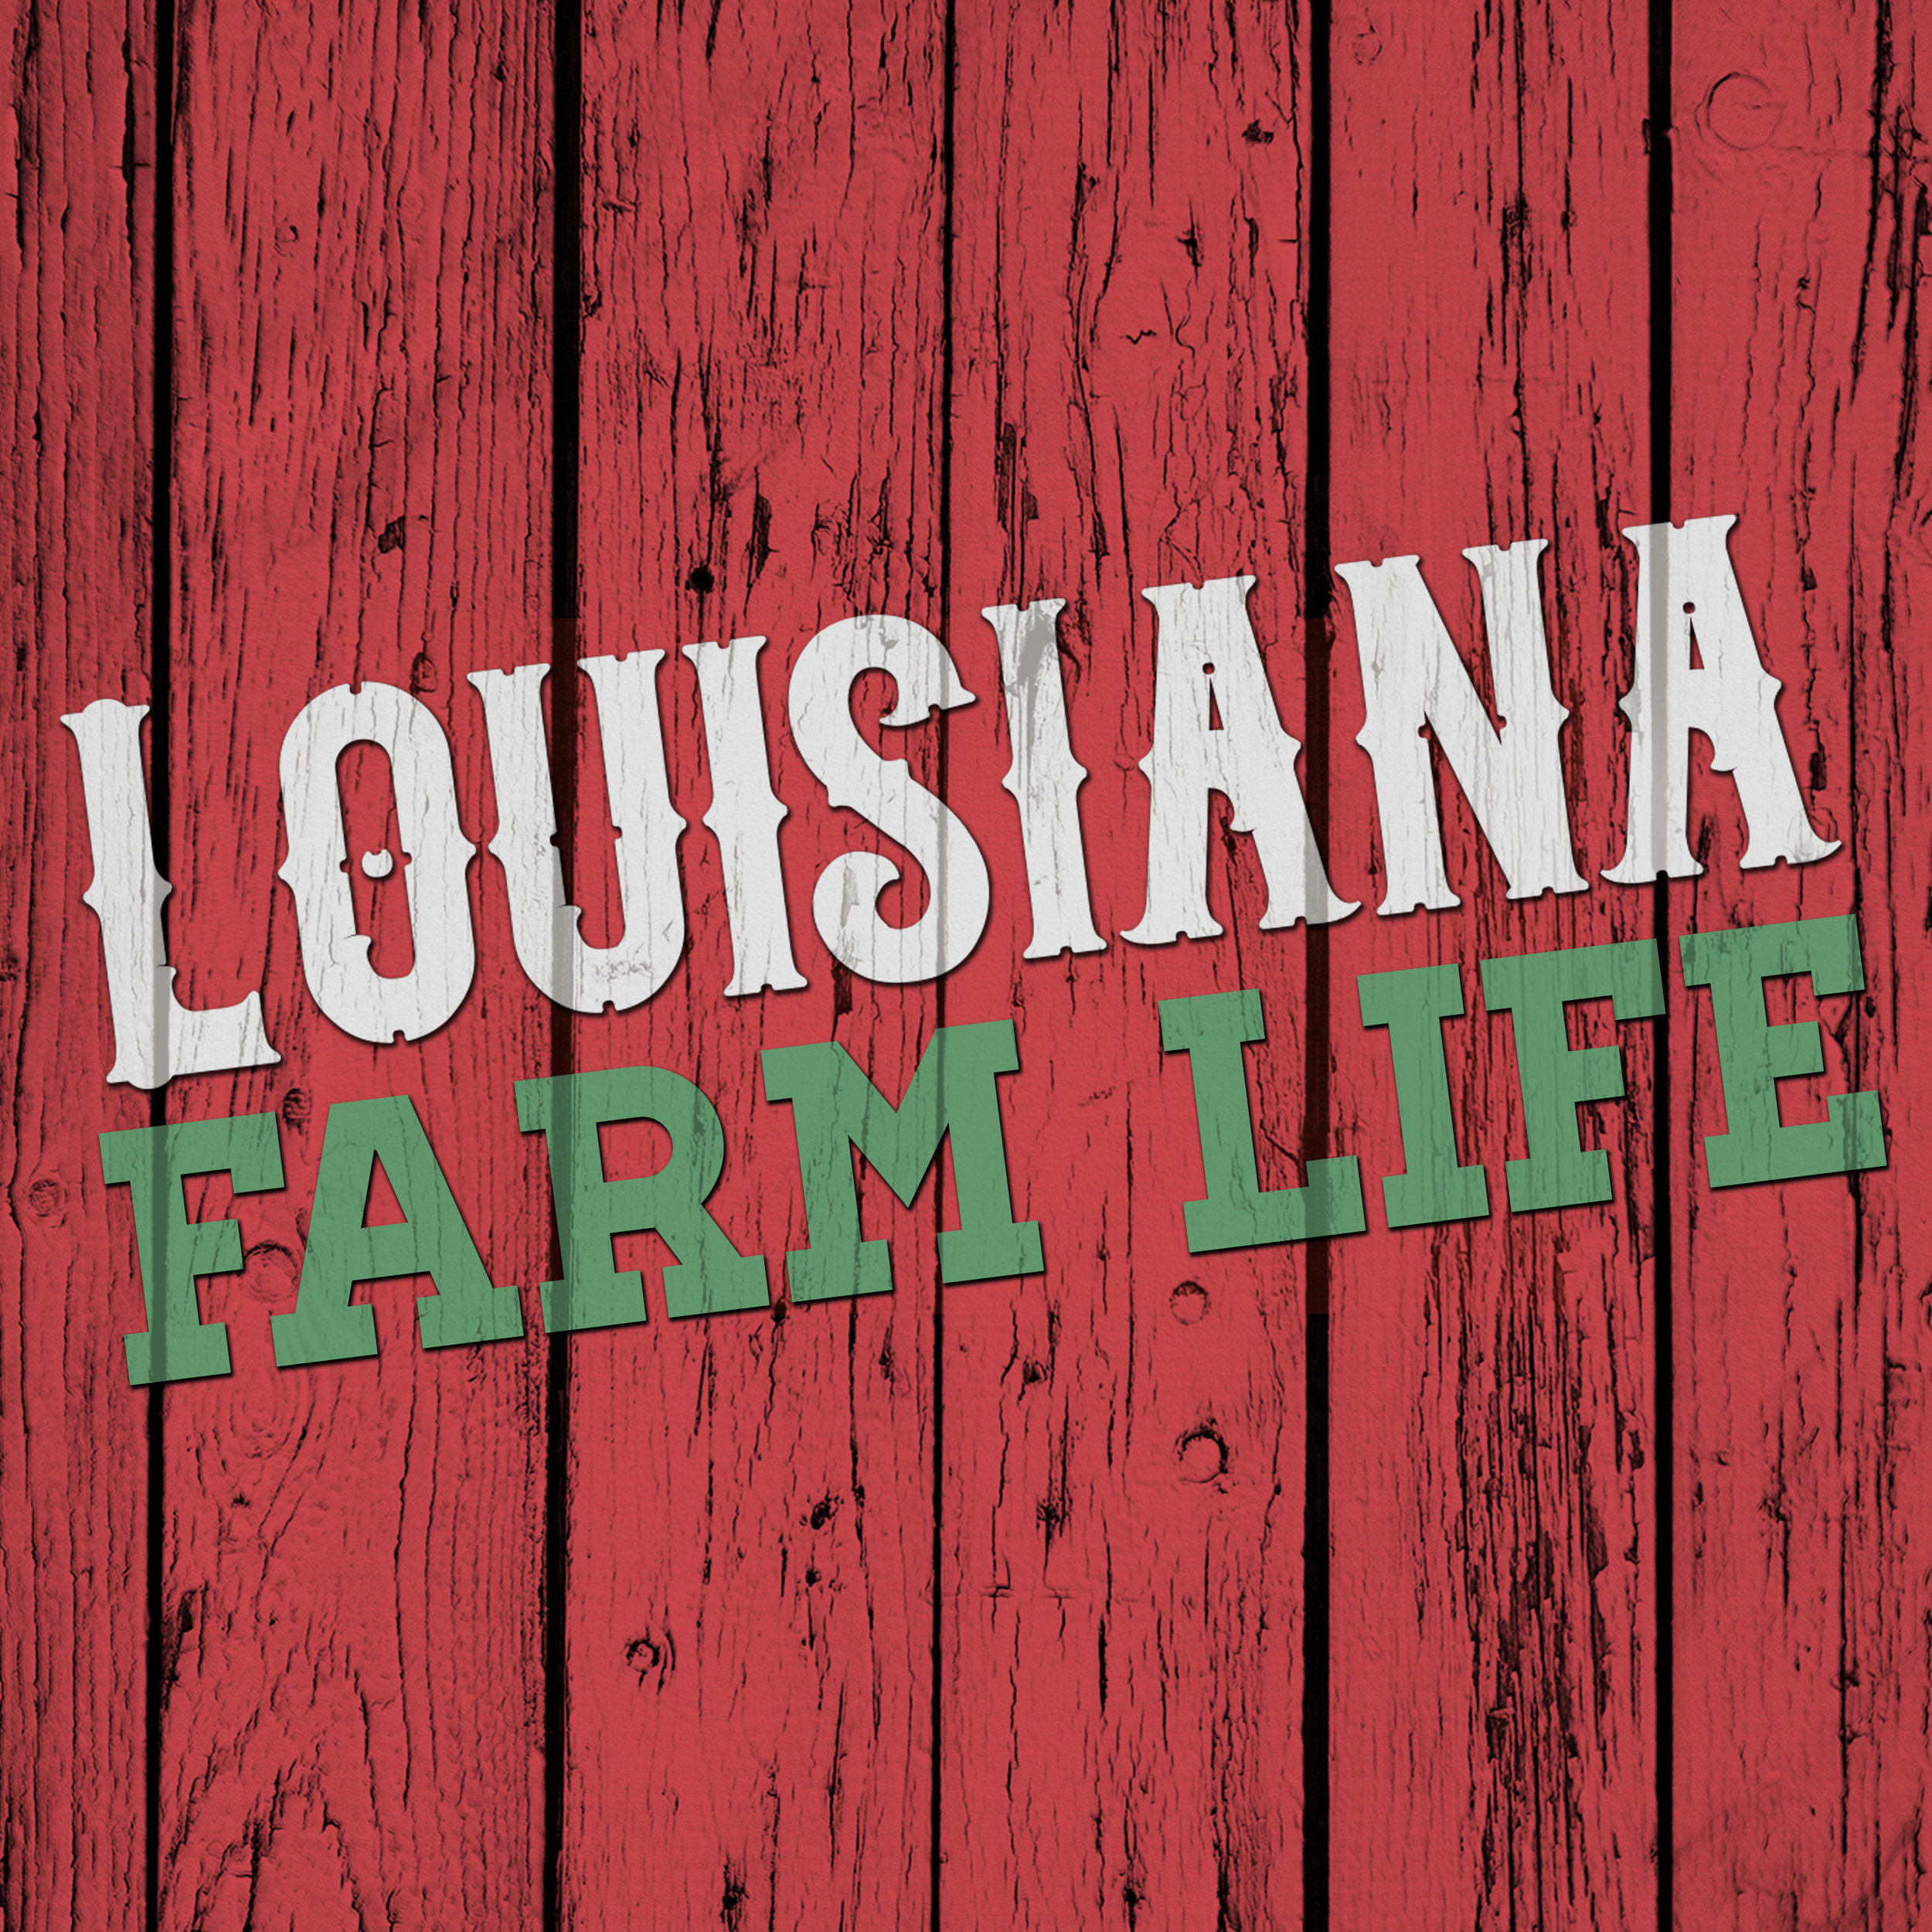 LouisianaFarmLife3000x3000.jpg